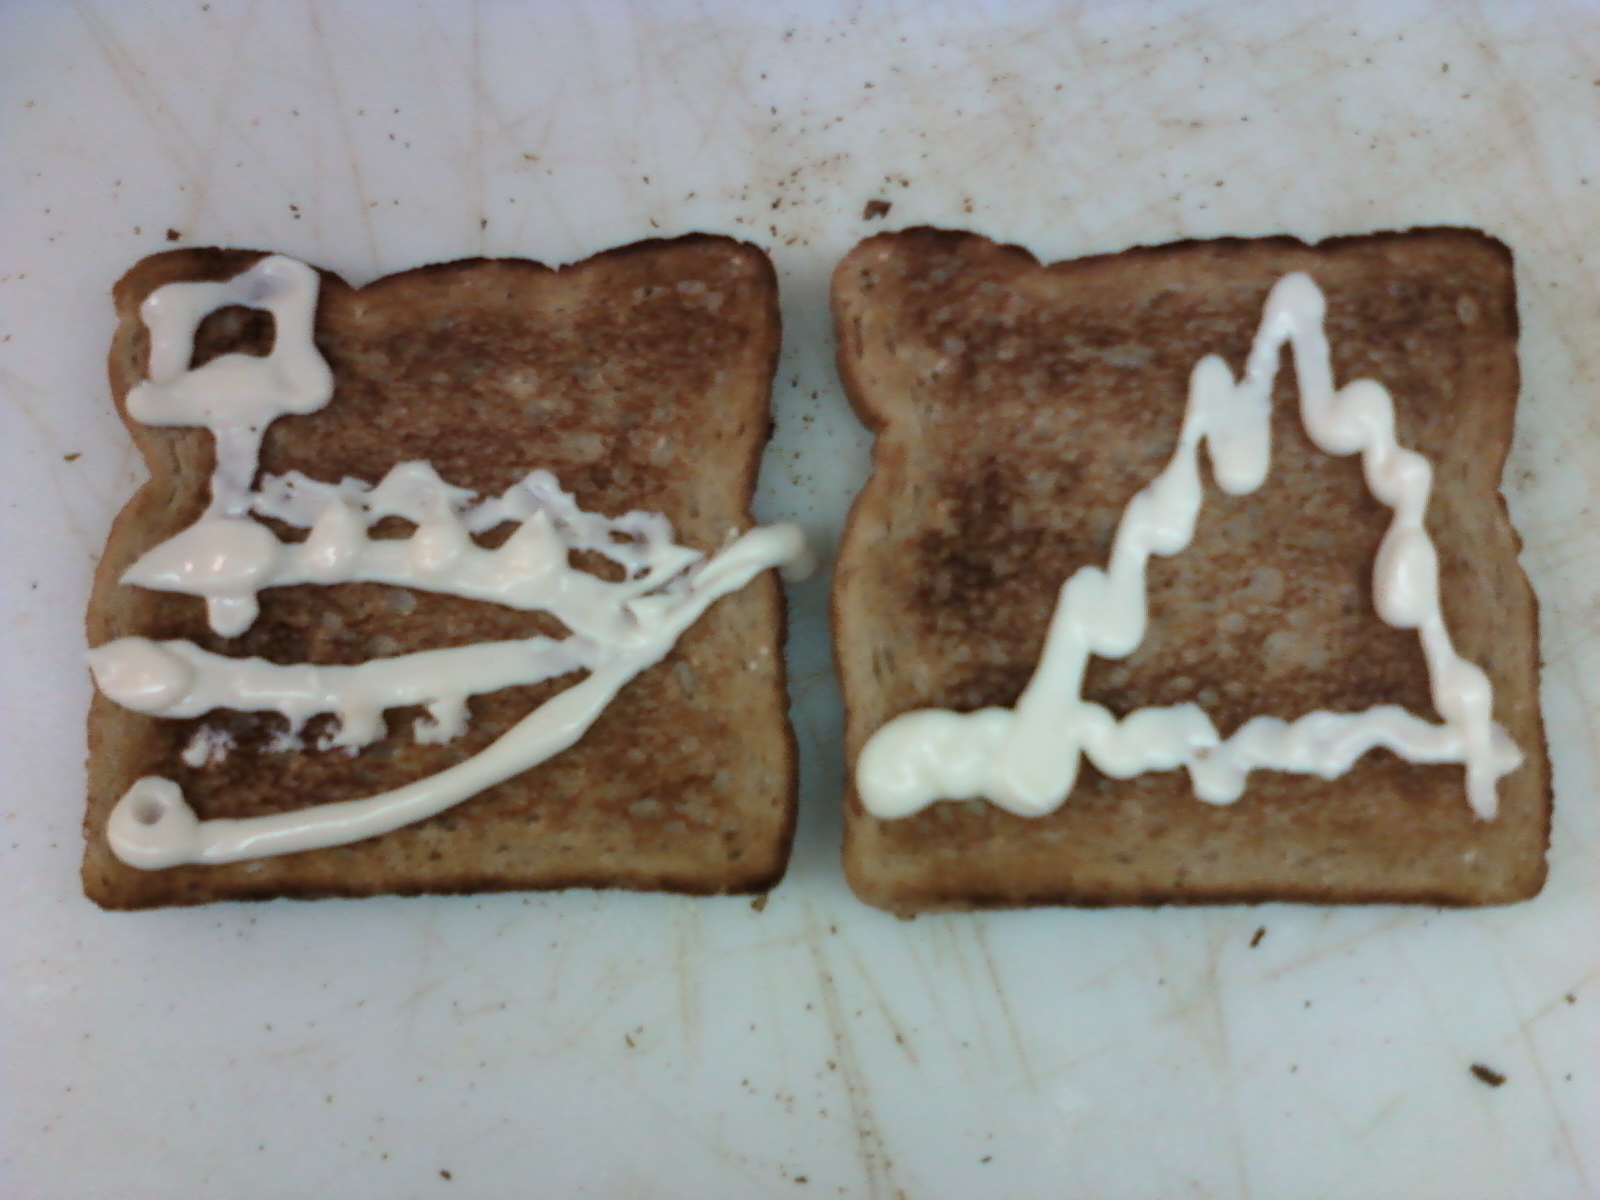 sandwich_art/0728110859.jpg